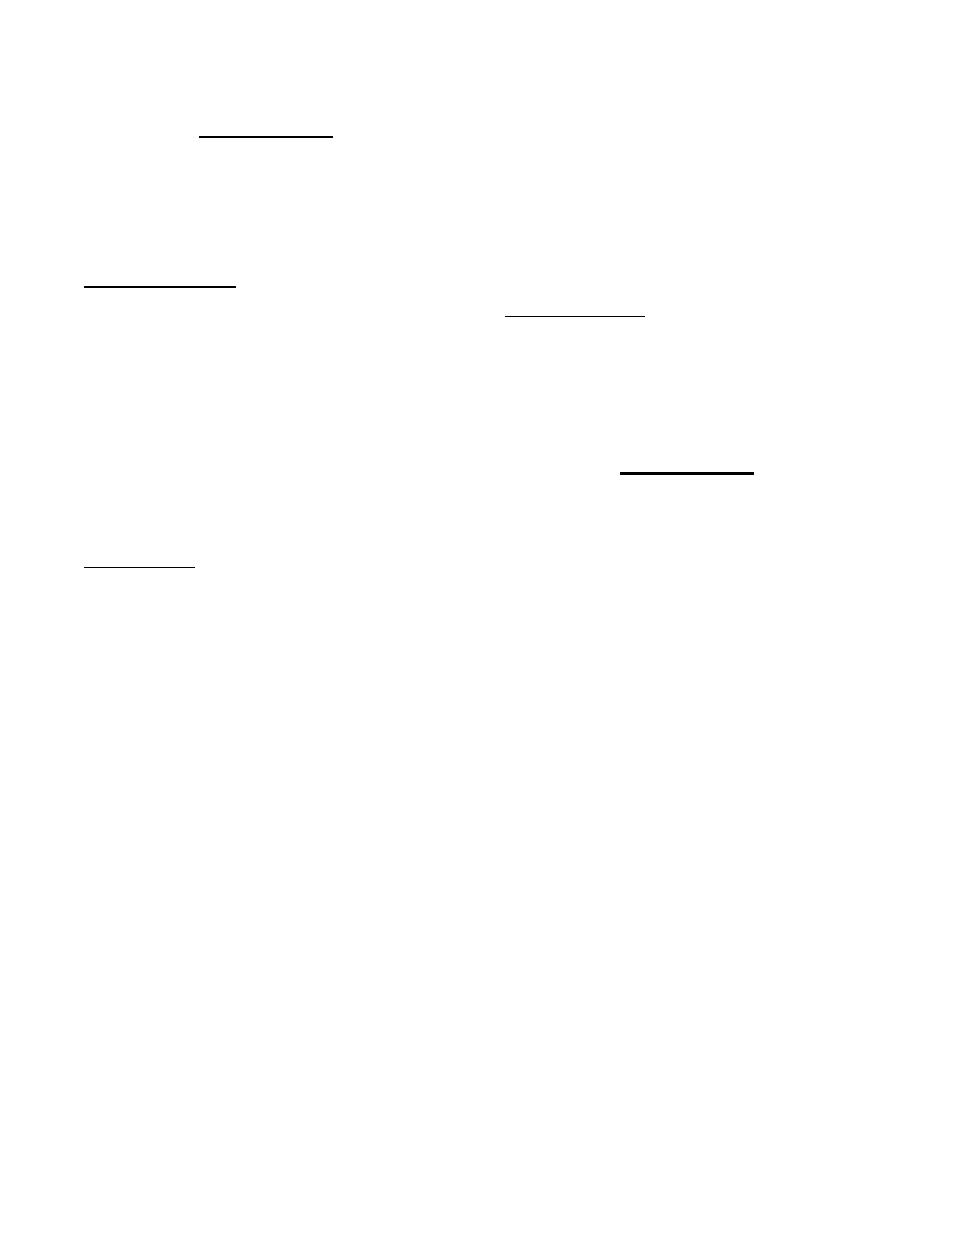 Quincy Compressor Wiring Diagram And Schematics Gardner Denver Motor Diagrams Warning